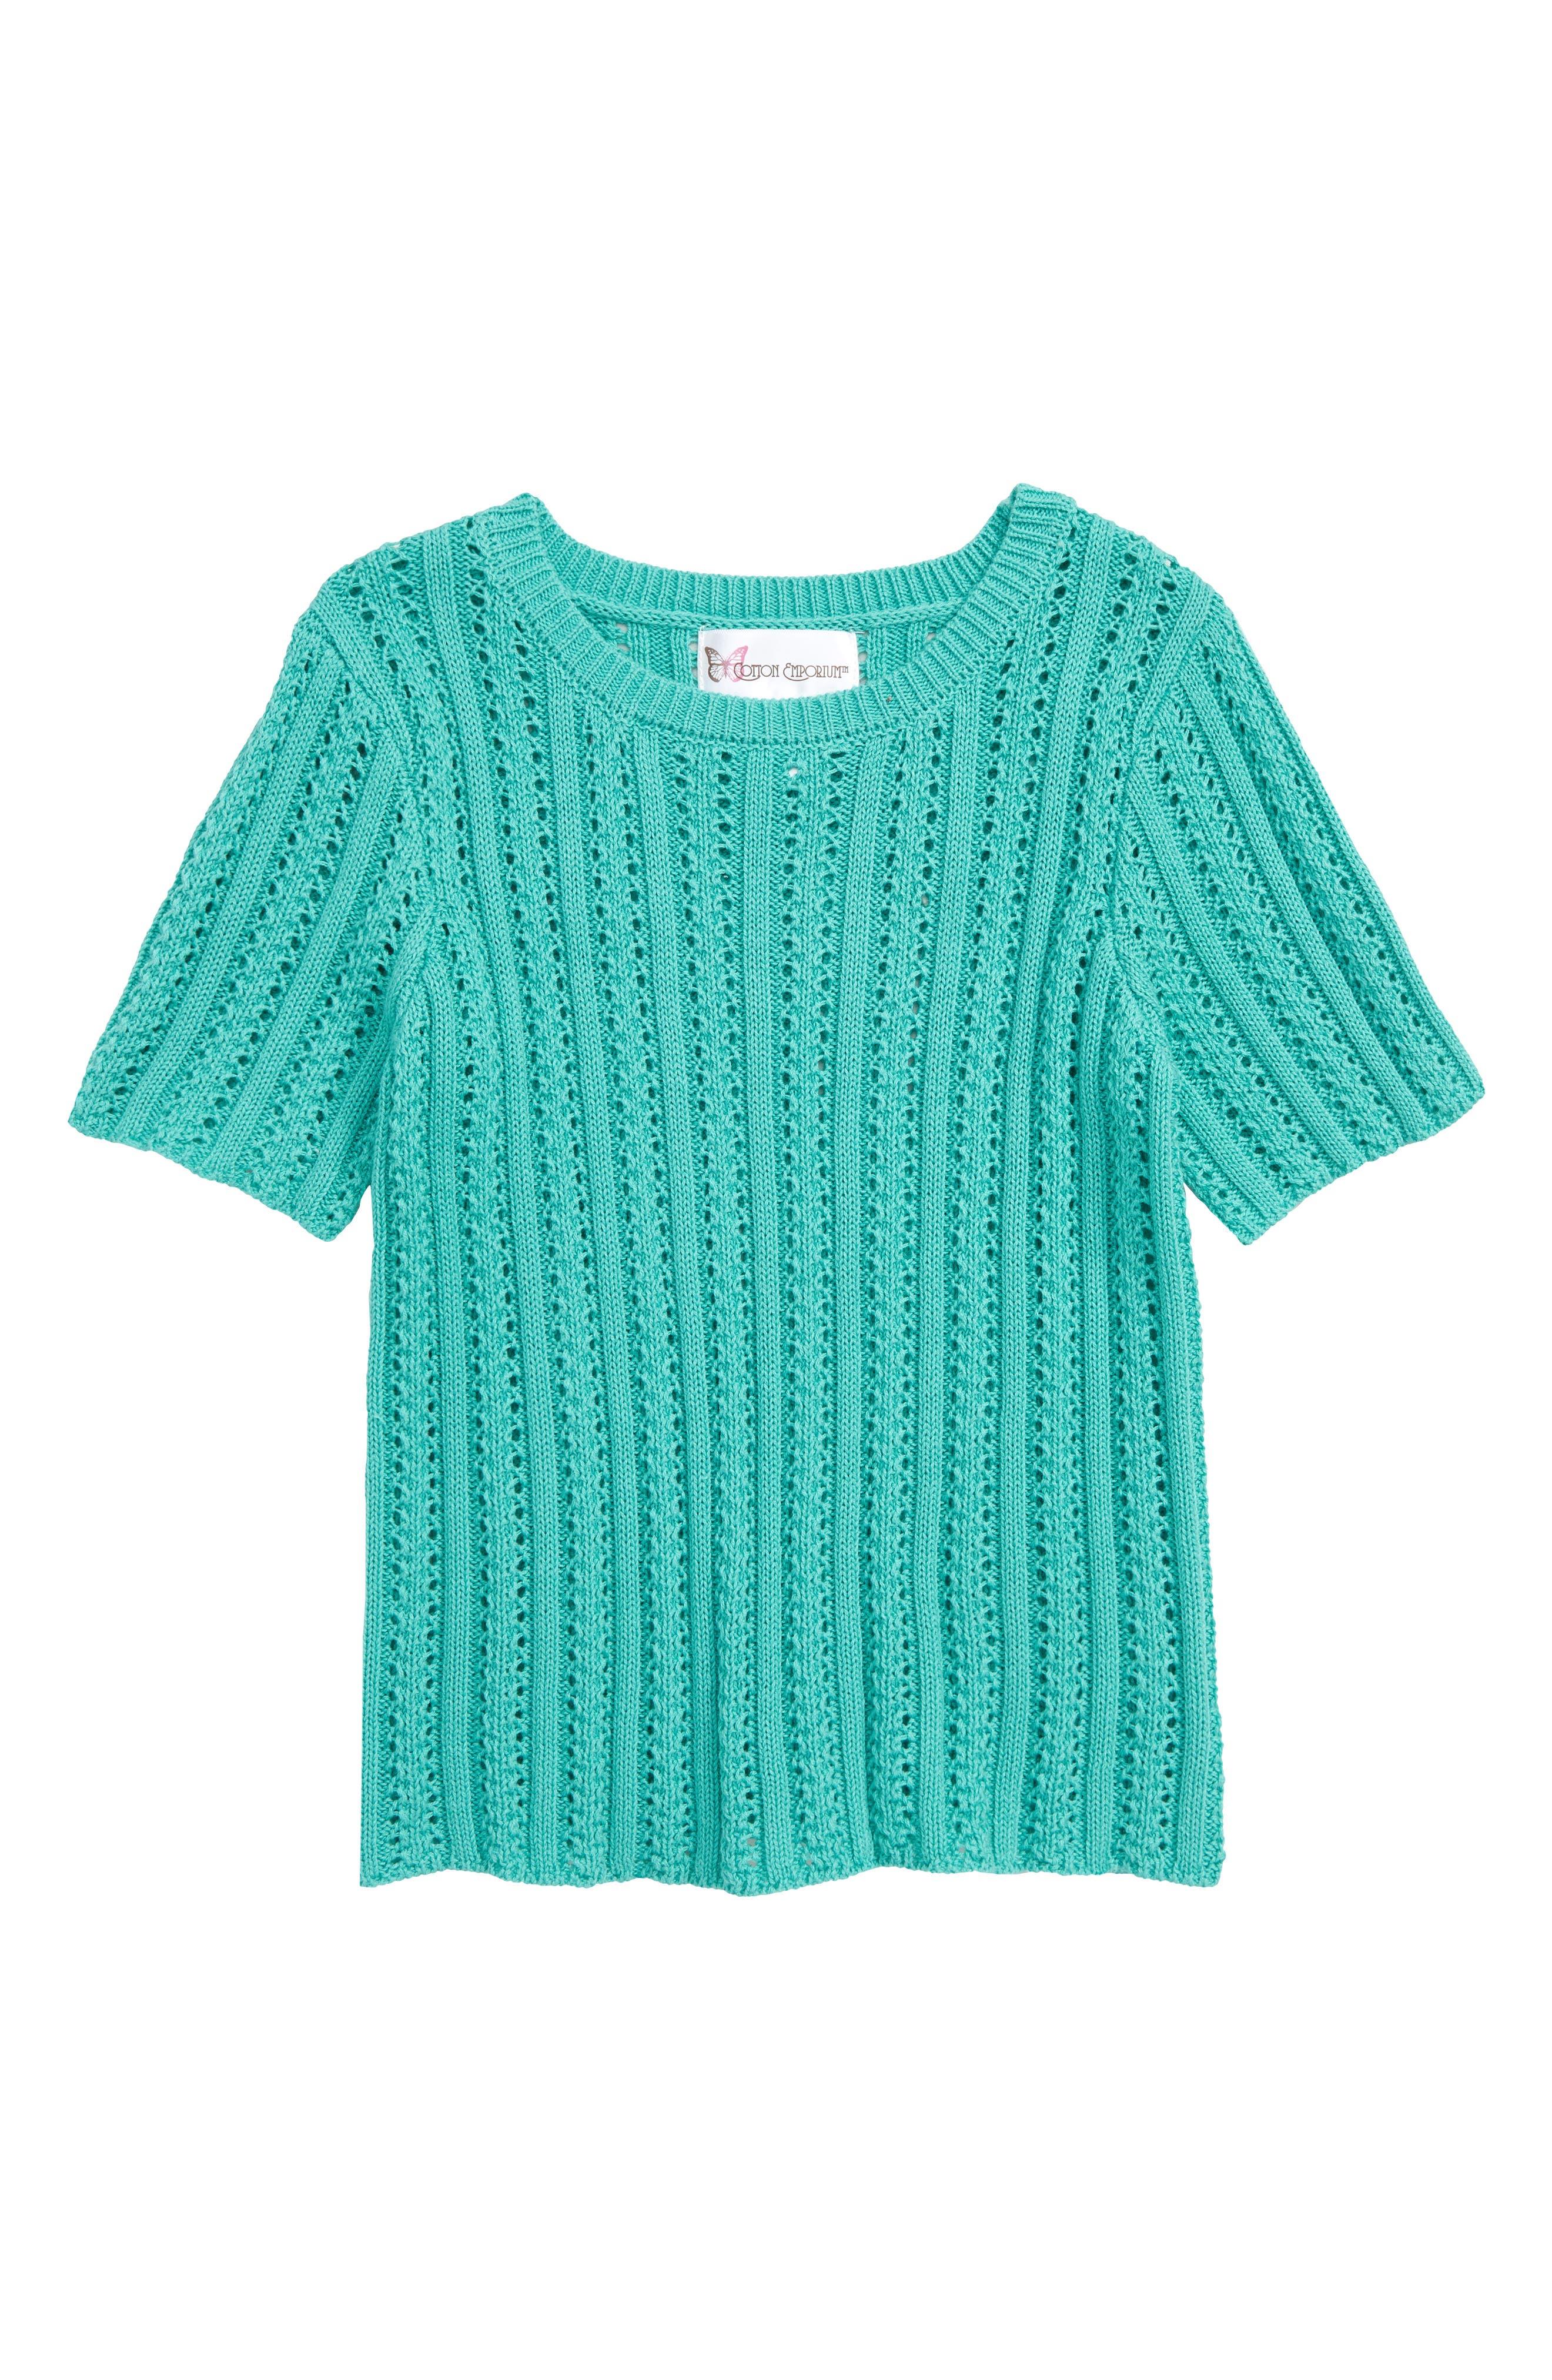 Girls Cotton Emporium Loose Knit Sweater Size XL (16)  Green